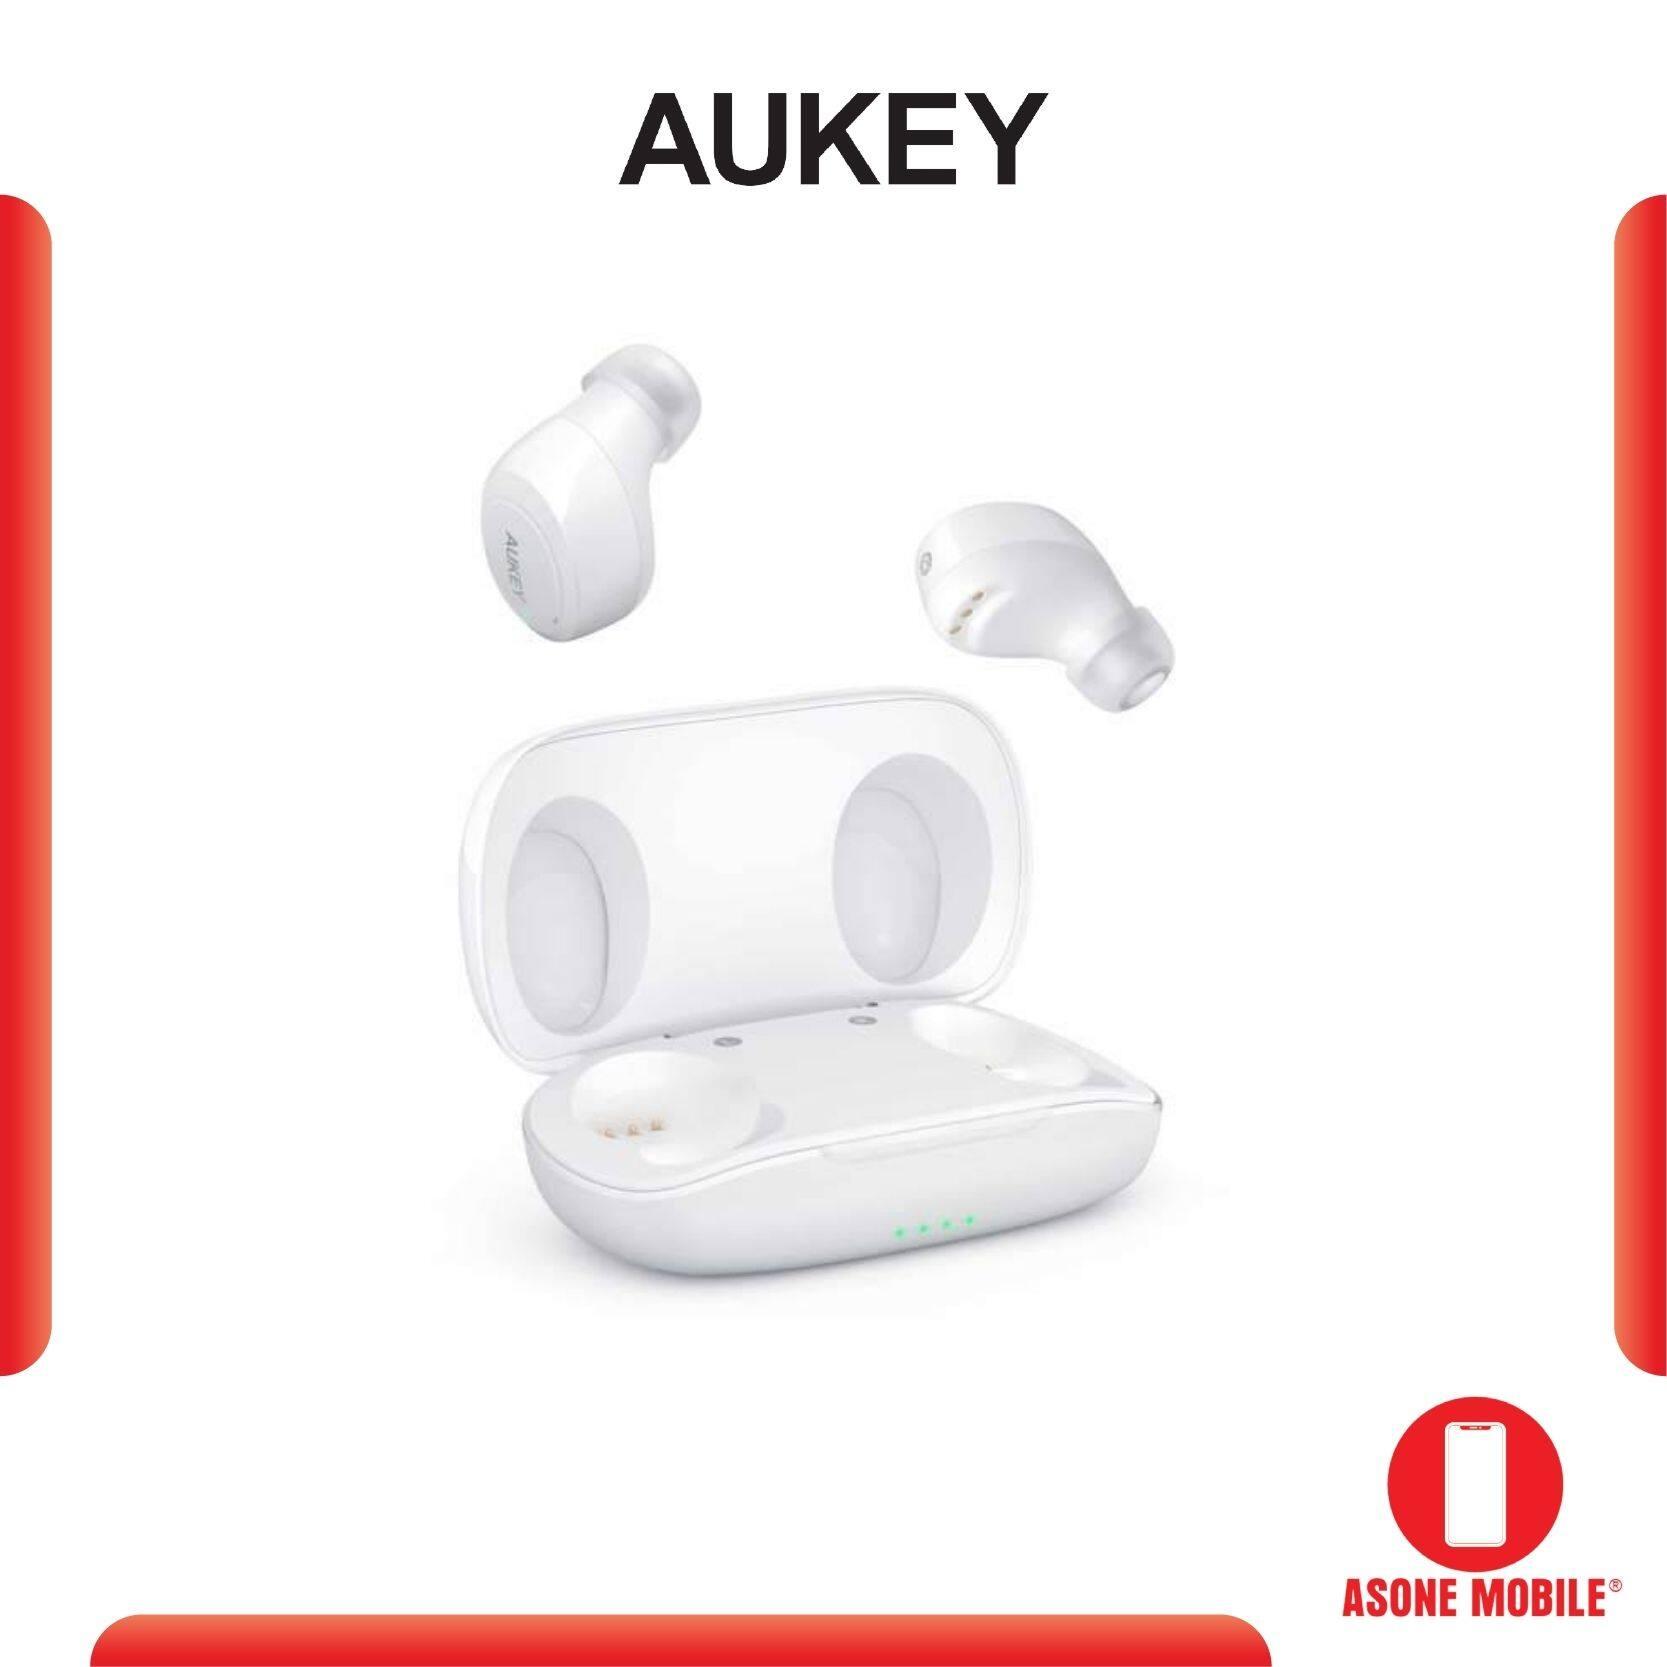 Aukey EP-T16S TWS Bluetooth 5.0 True Wireless Earbuds 2 year warranty